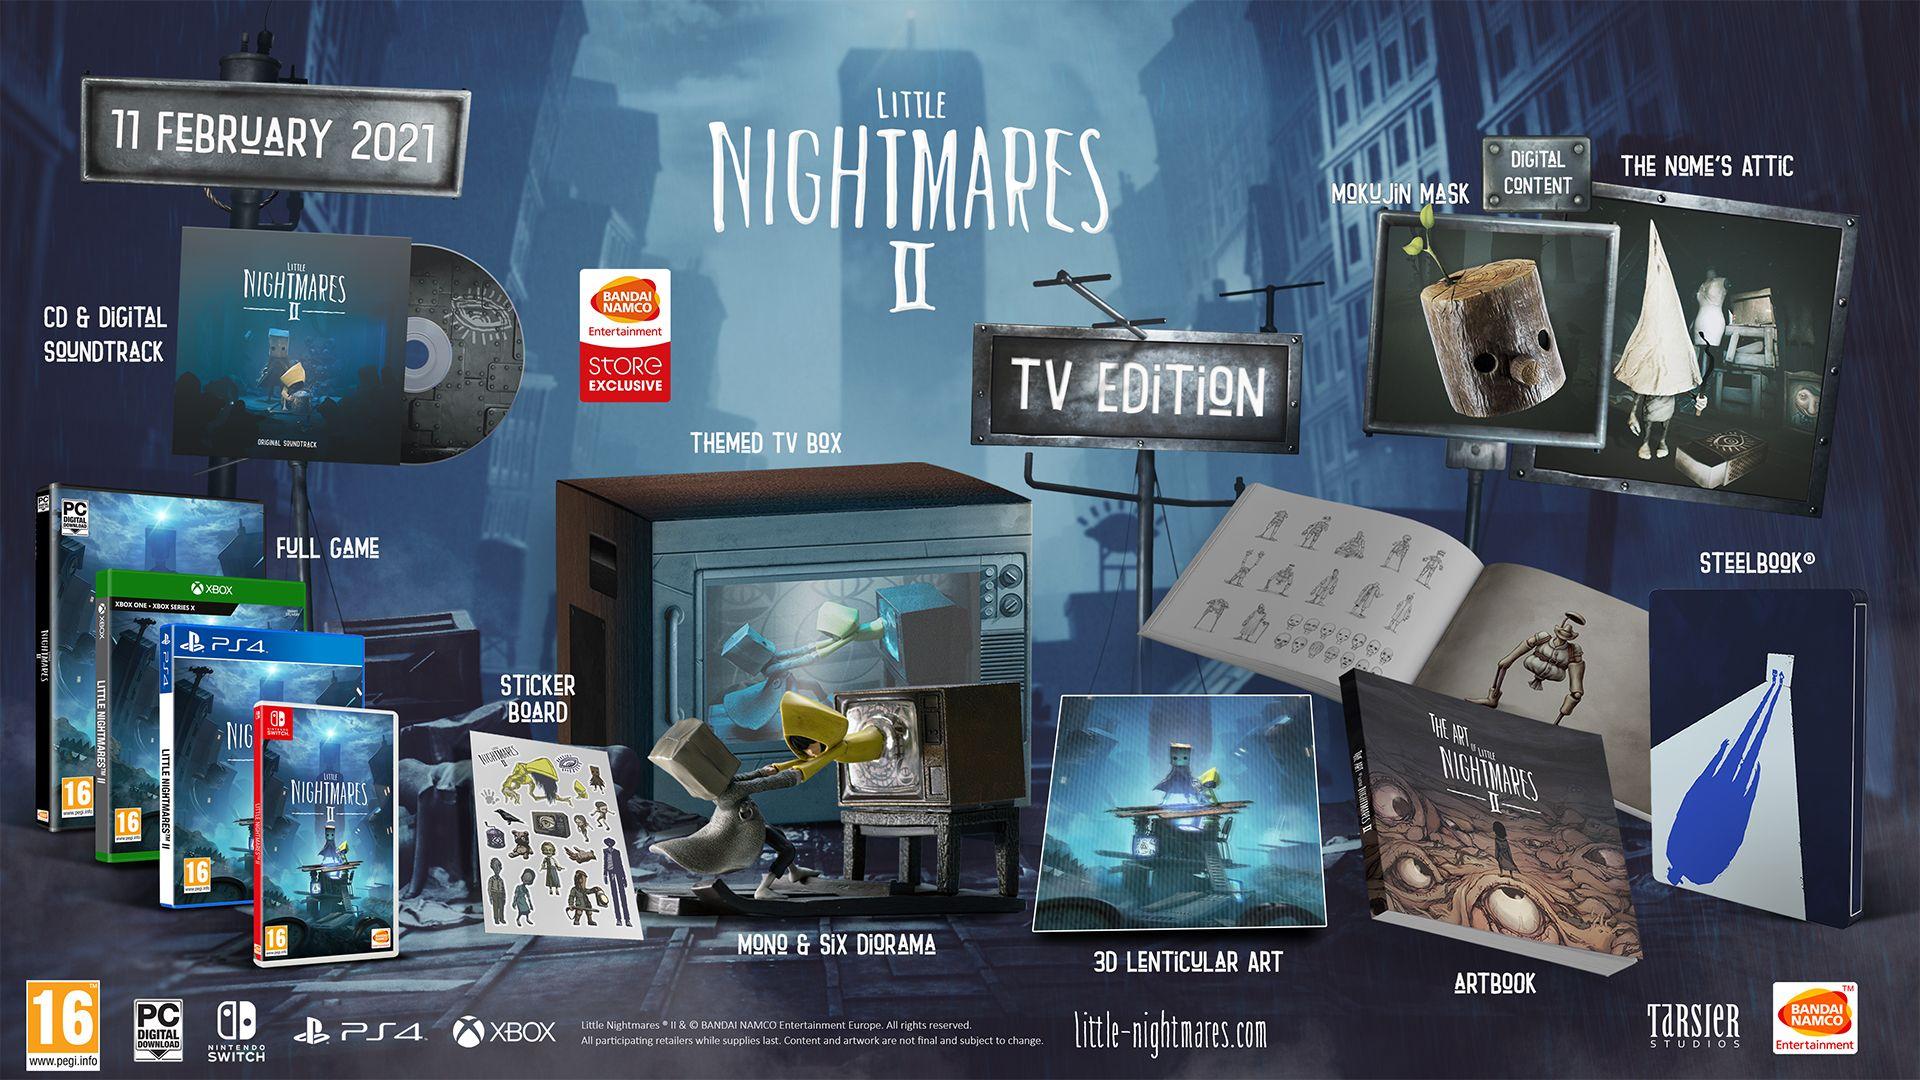 TV Edition Store Little Nightmares 2